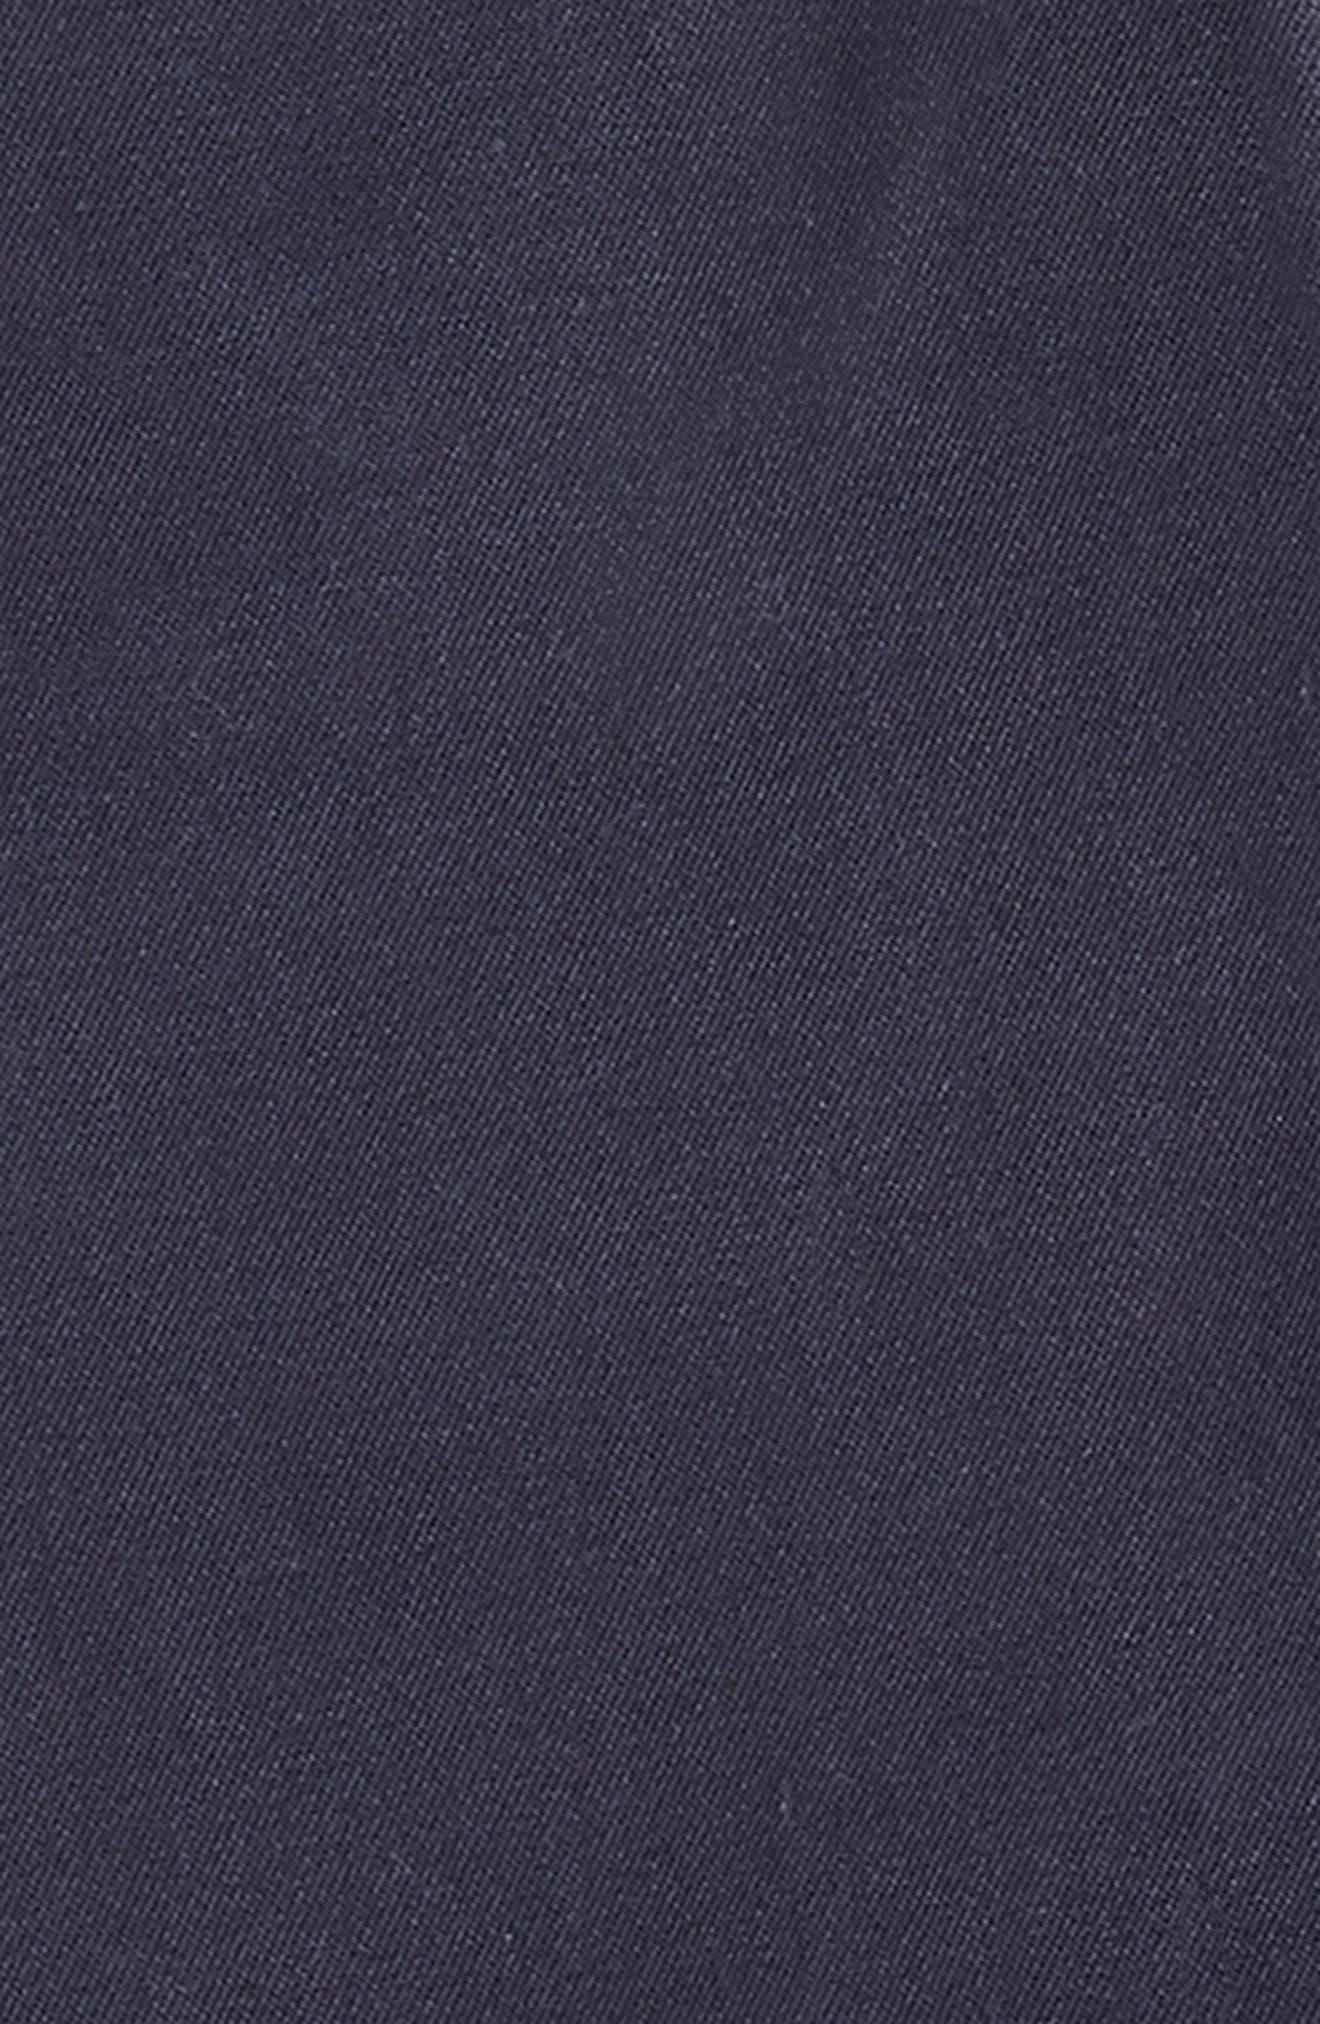 Cotton Twill Pants,                             Alternate thumbnail 3, color,                             424